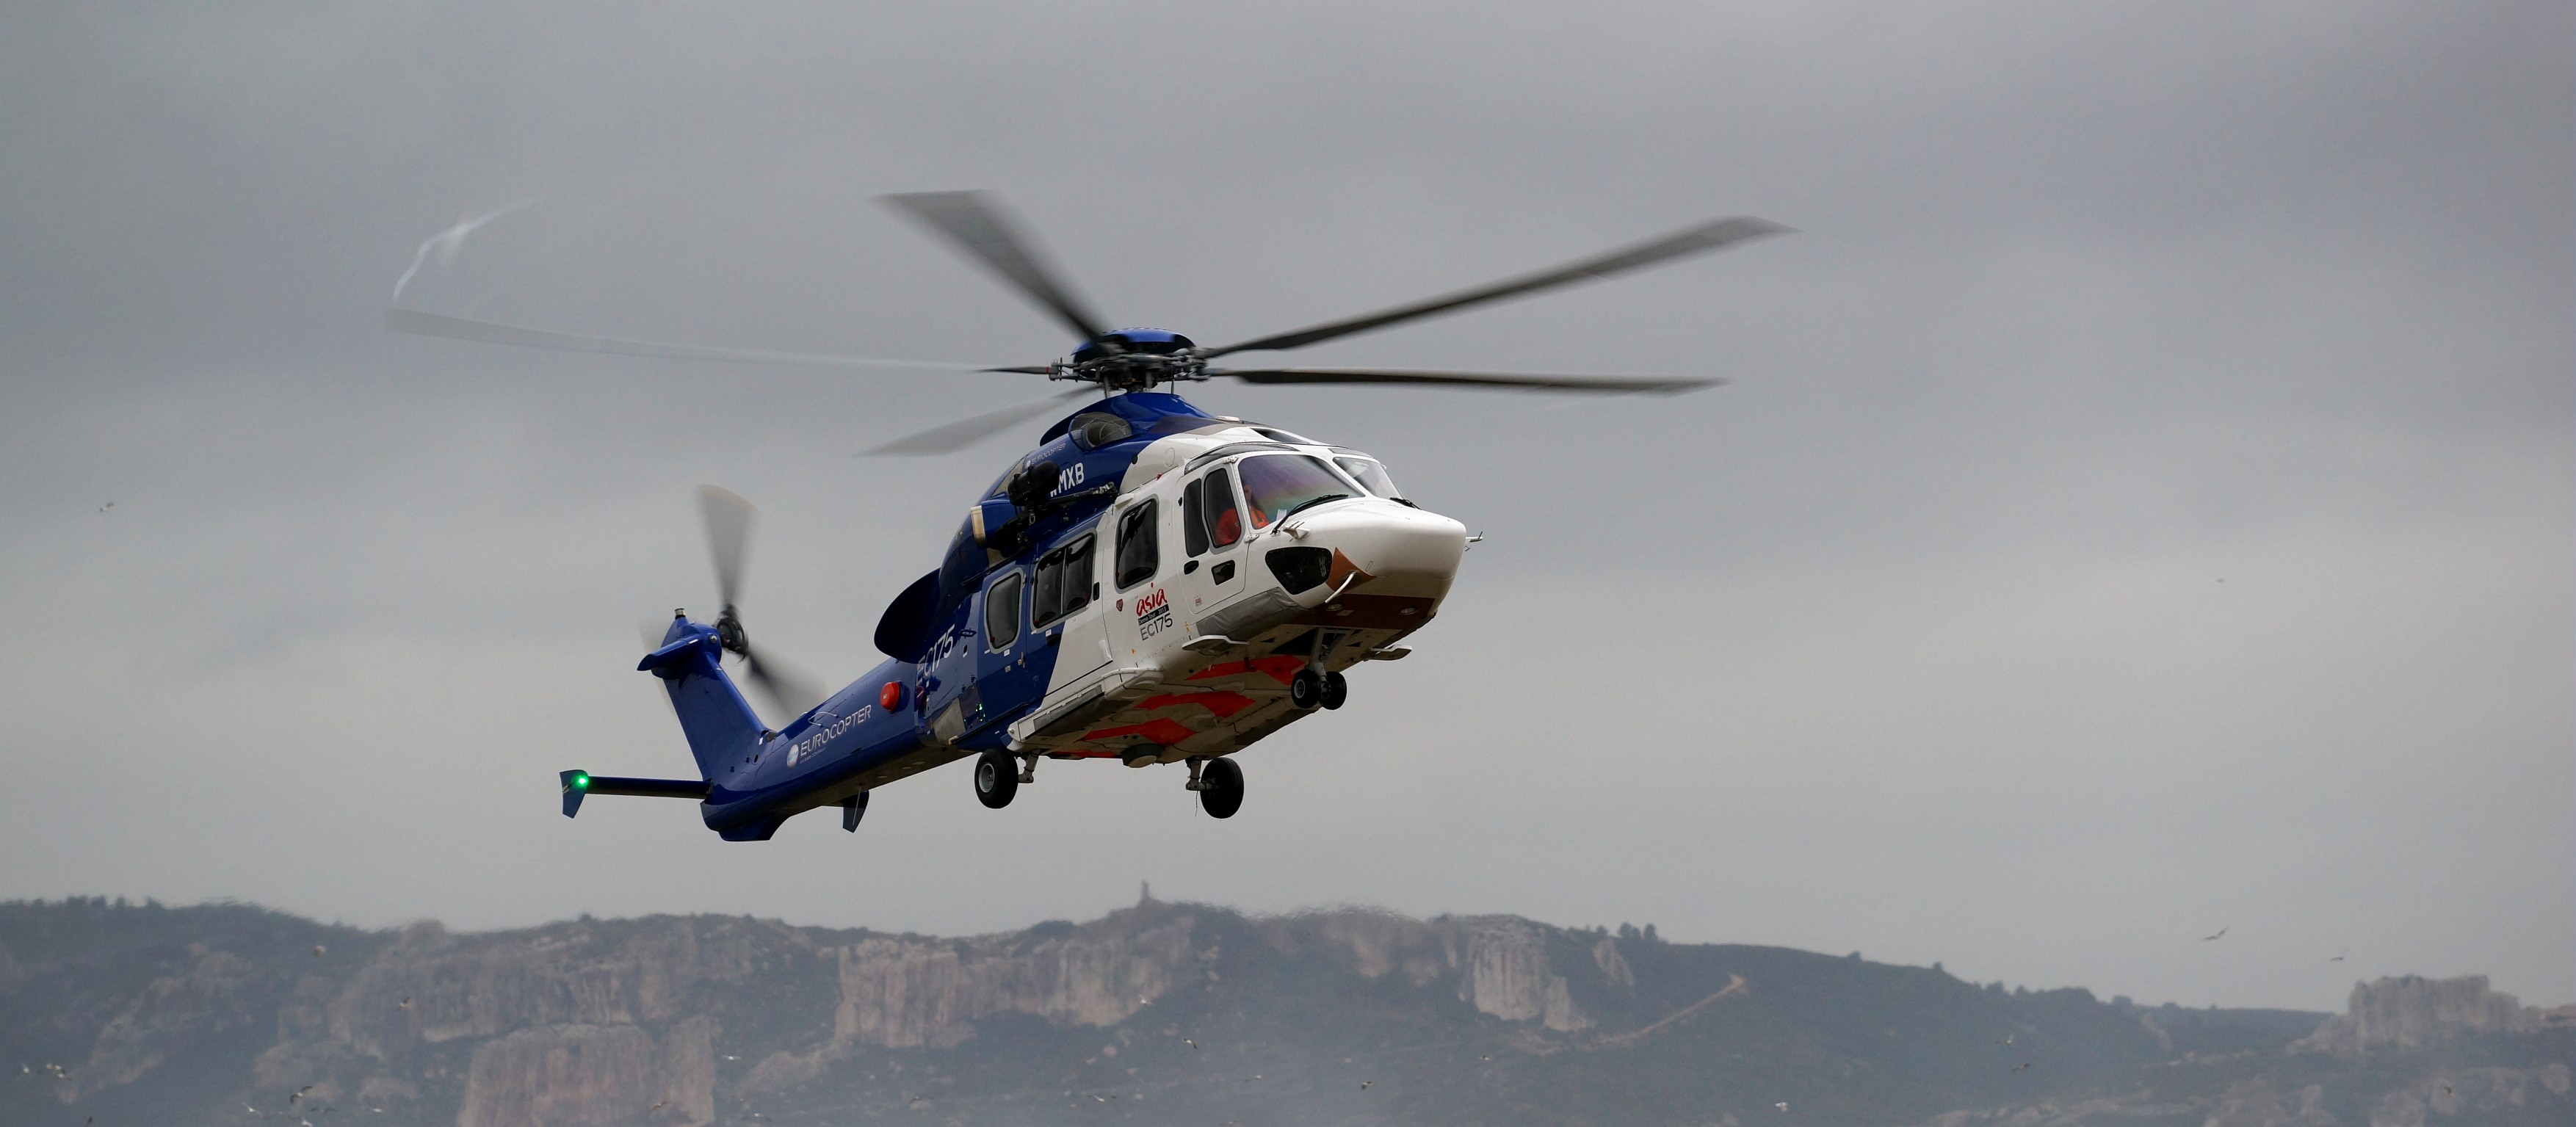 10 飞机 直升机 3508_1535